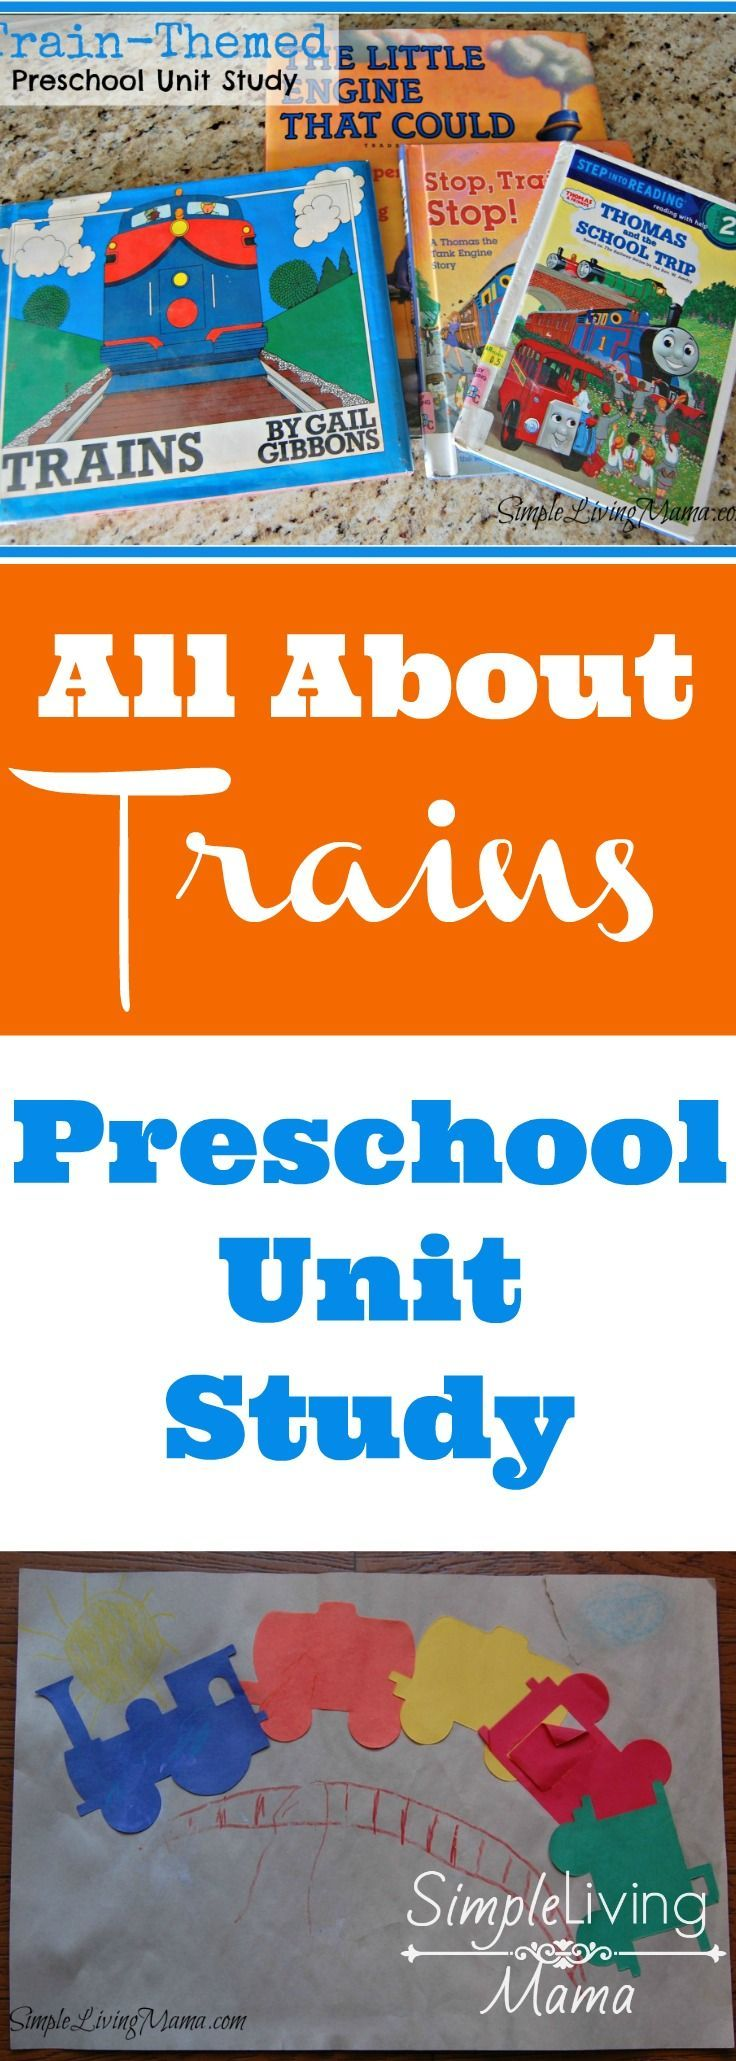 Unit study colors preschool - All About Trains A Preschool Unit Study On Trains